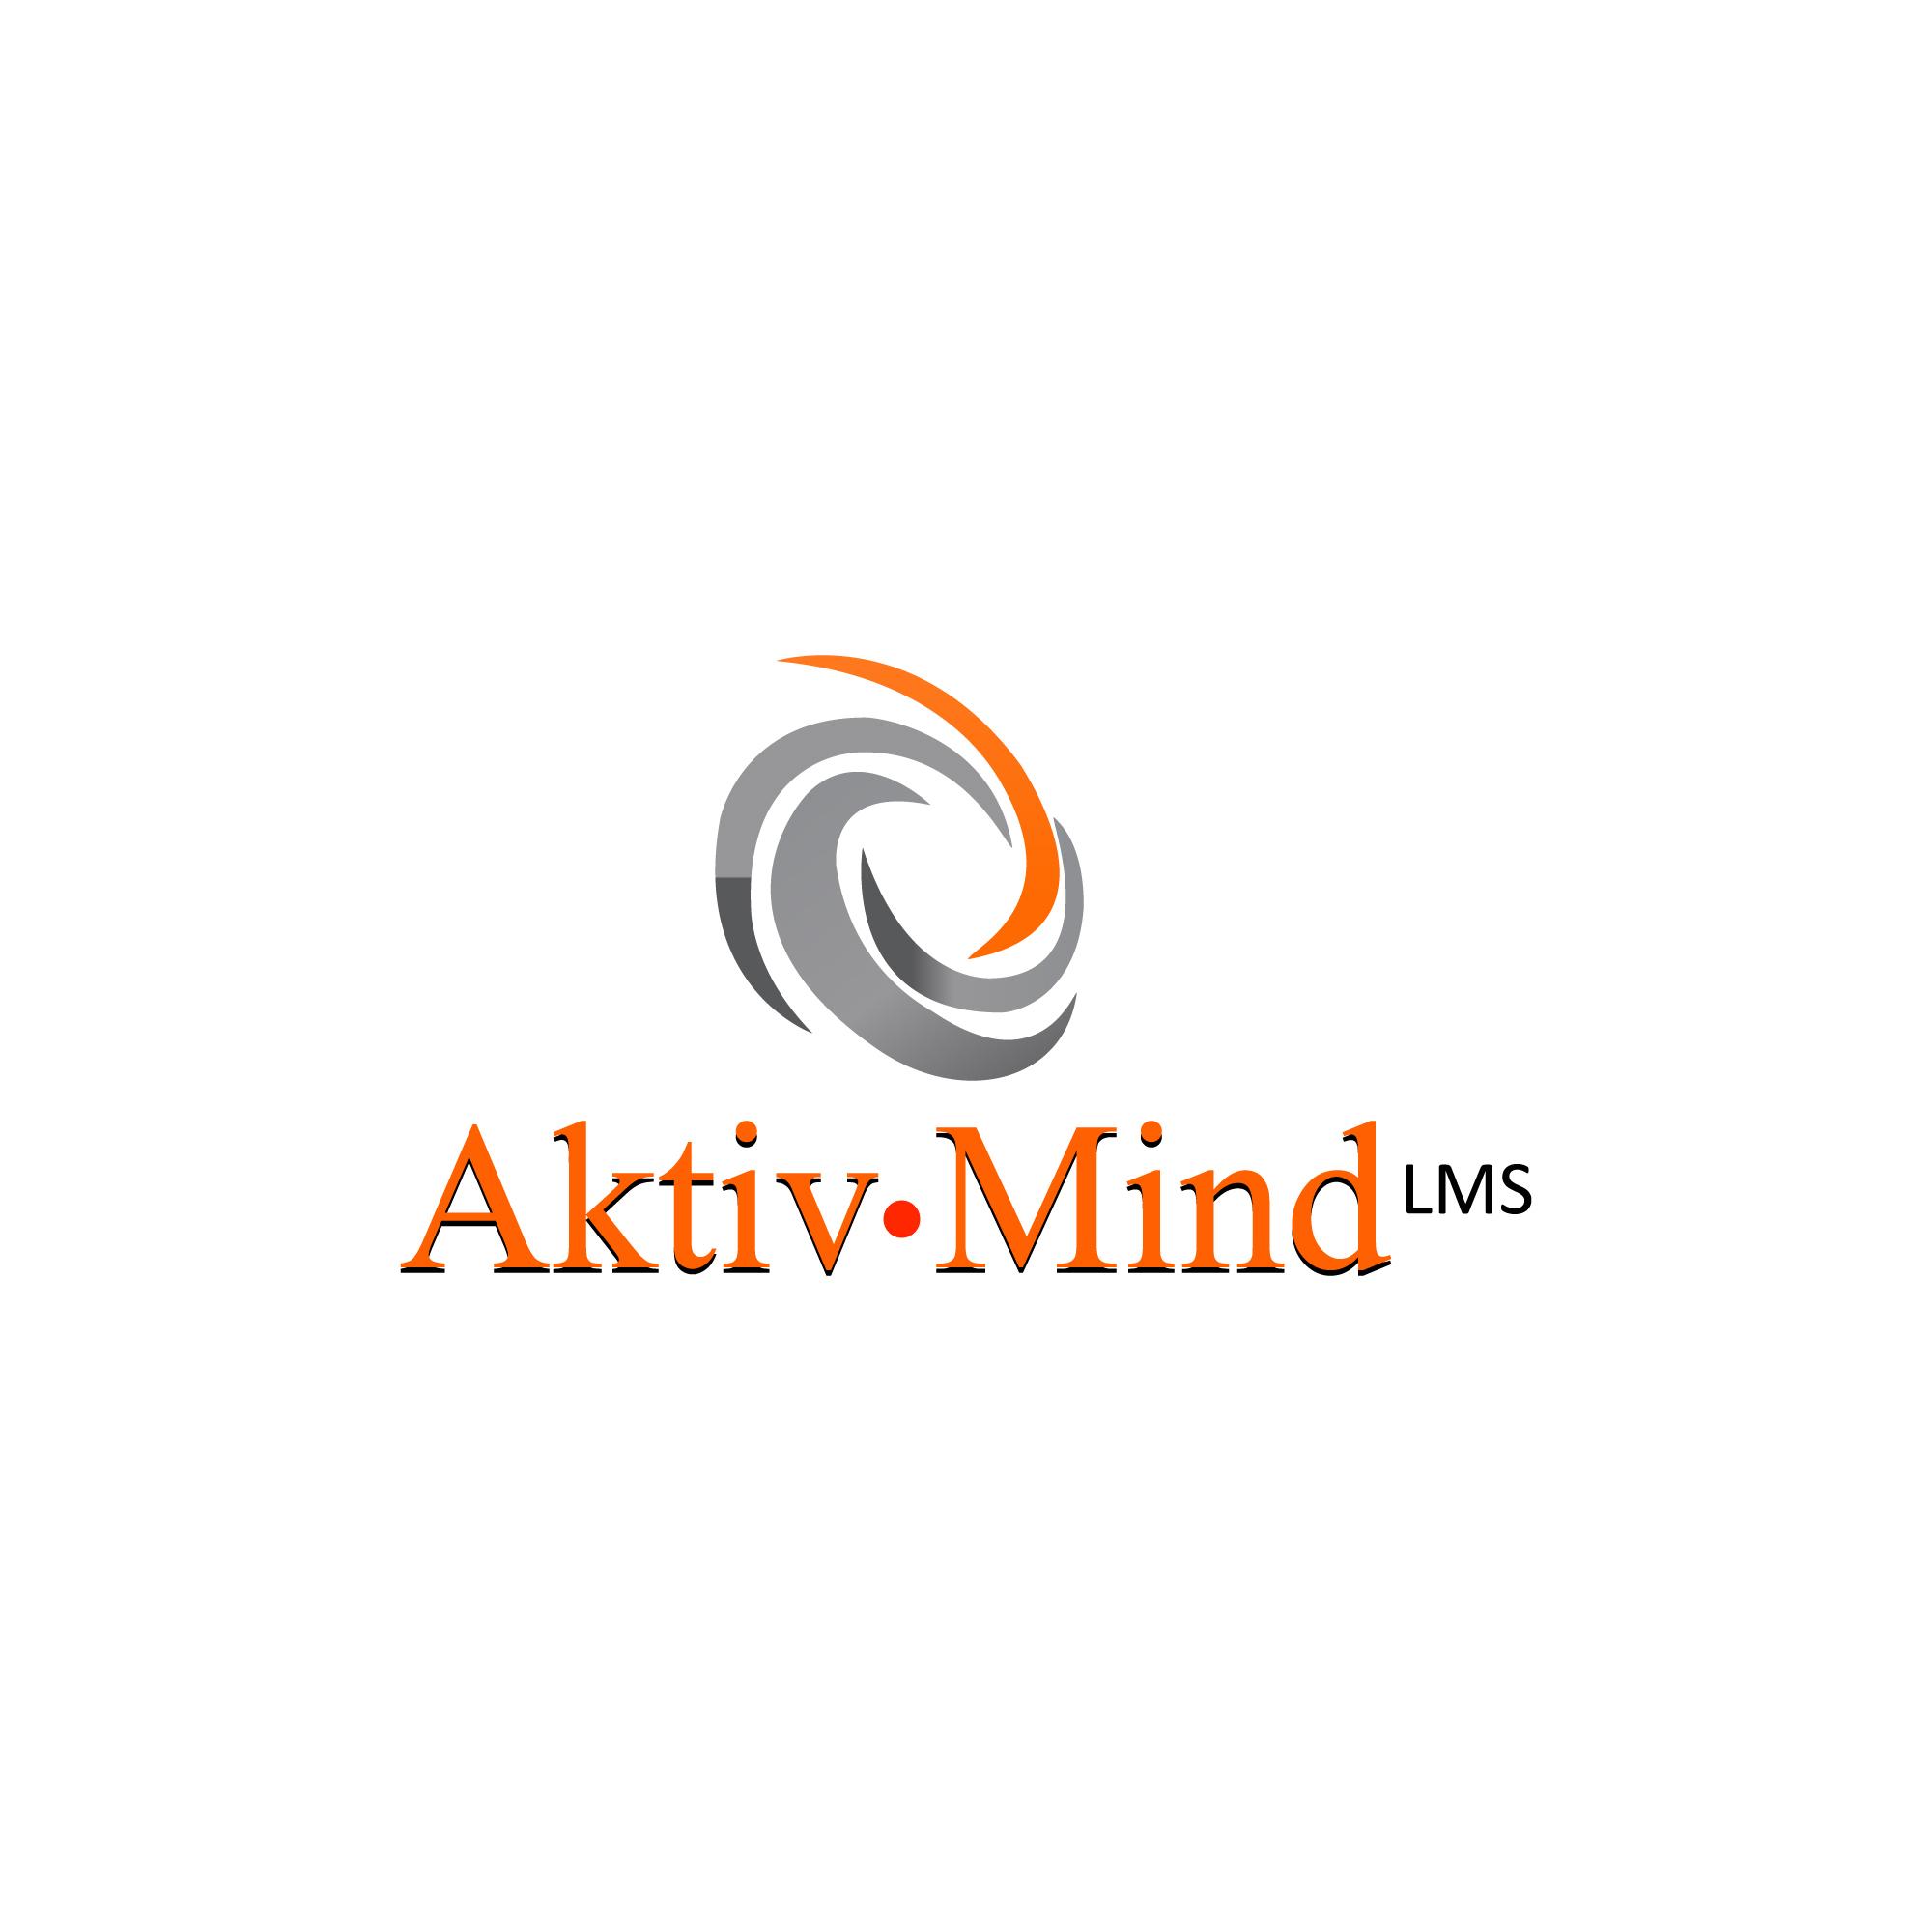 Aktiv Mind LMS